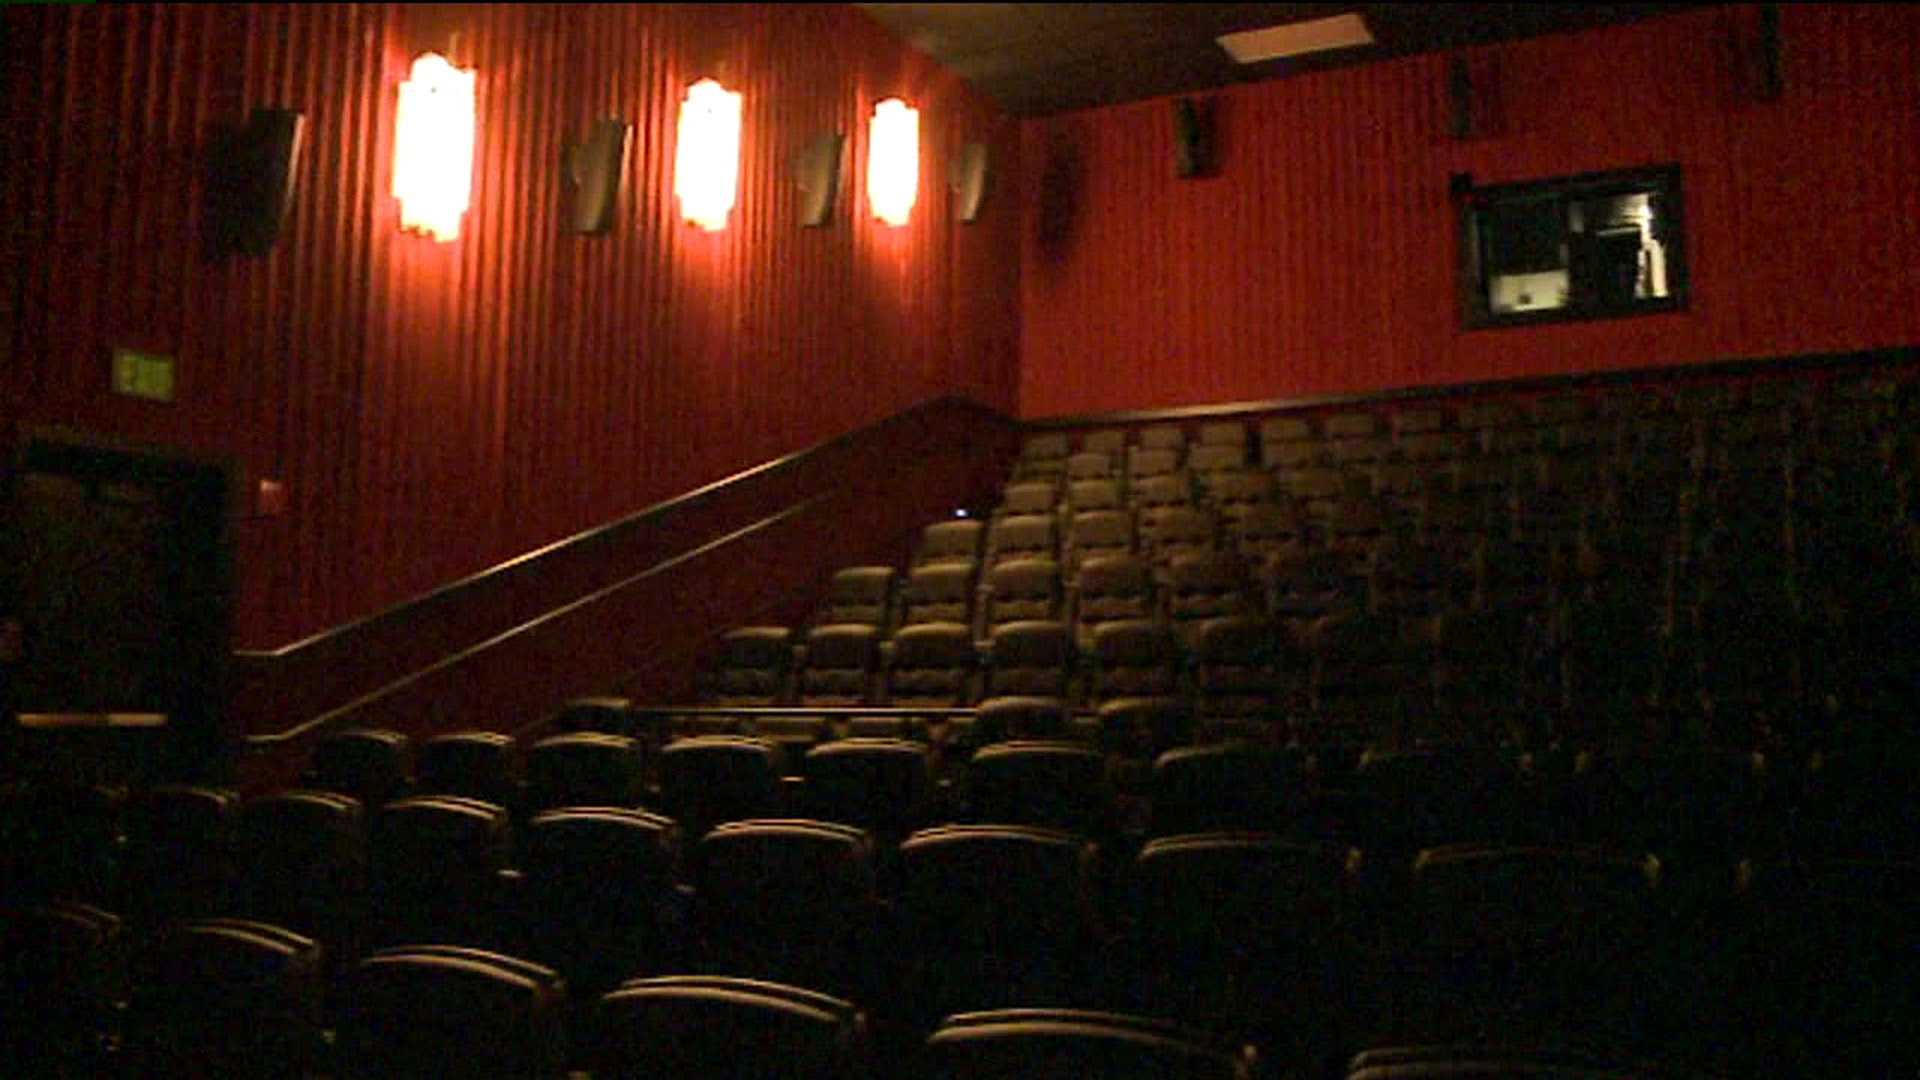 Movie Theater Wallpaper  WallpaperSafari